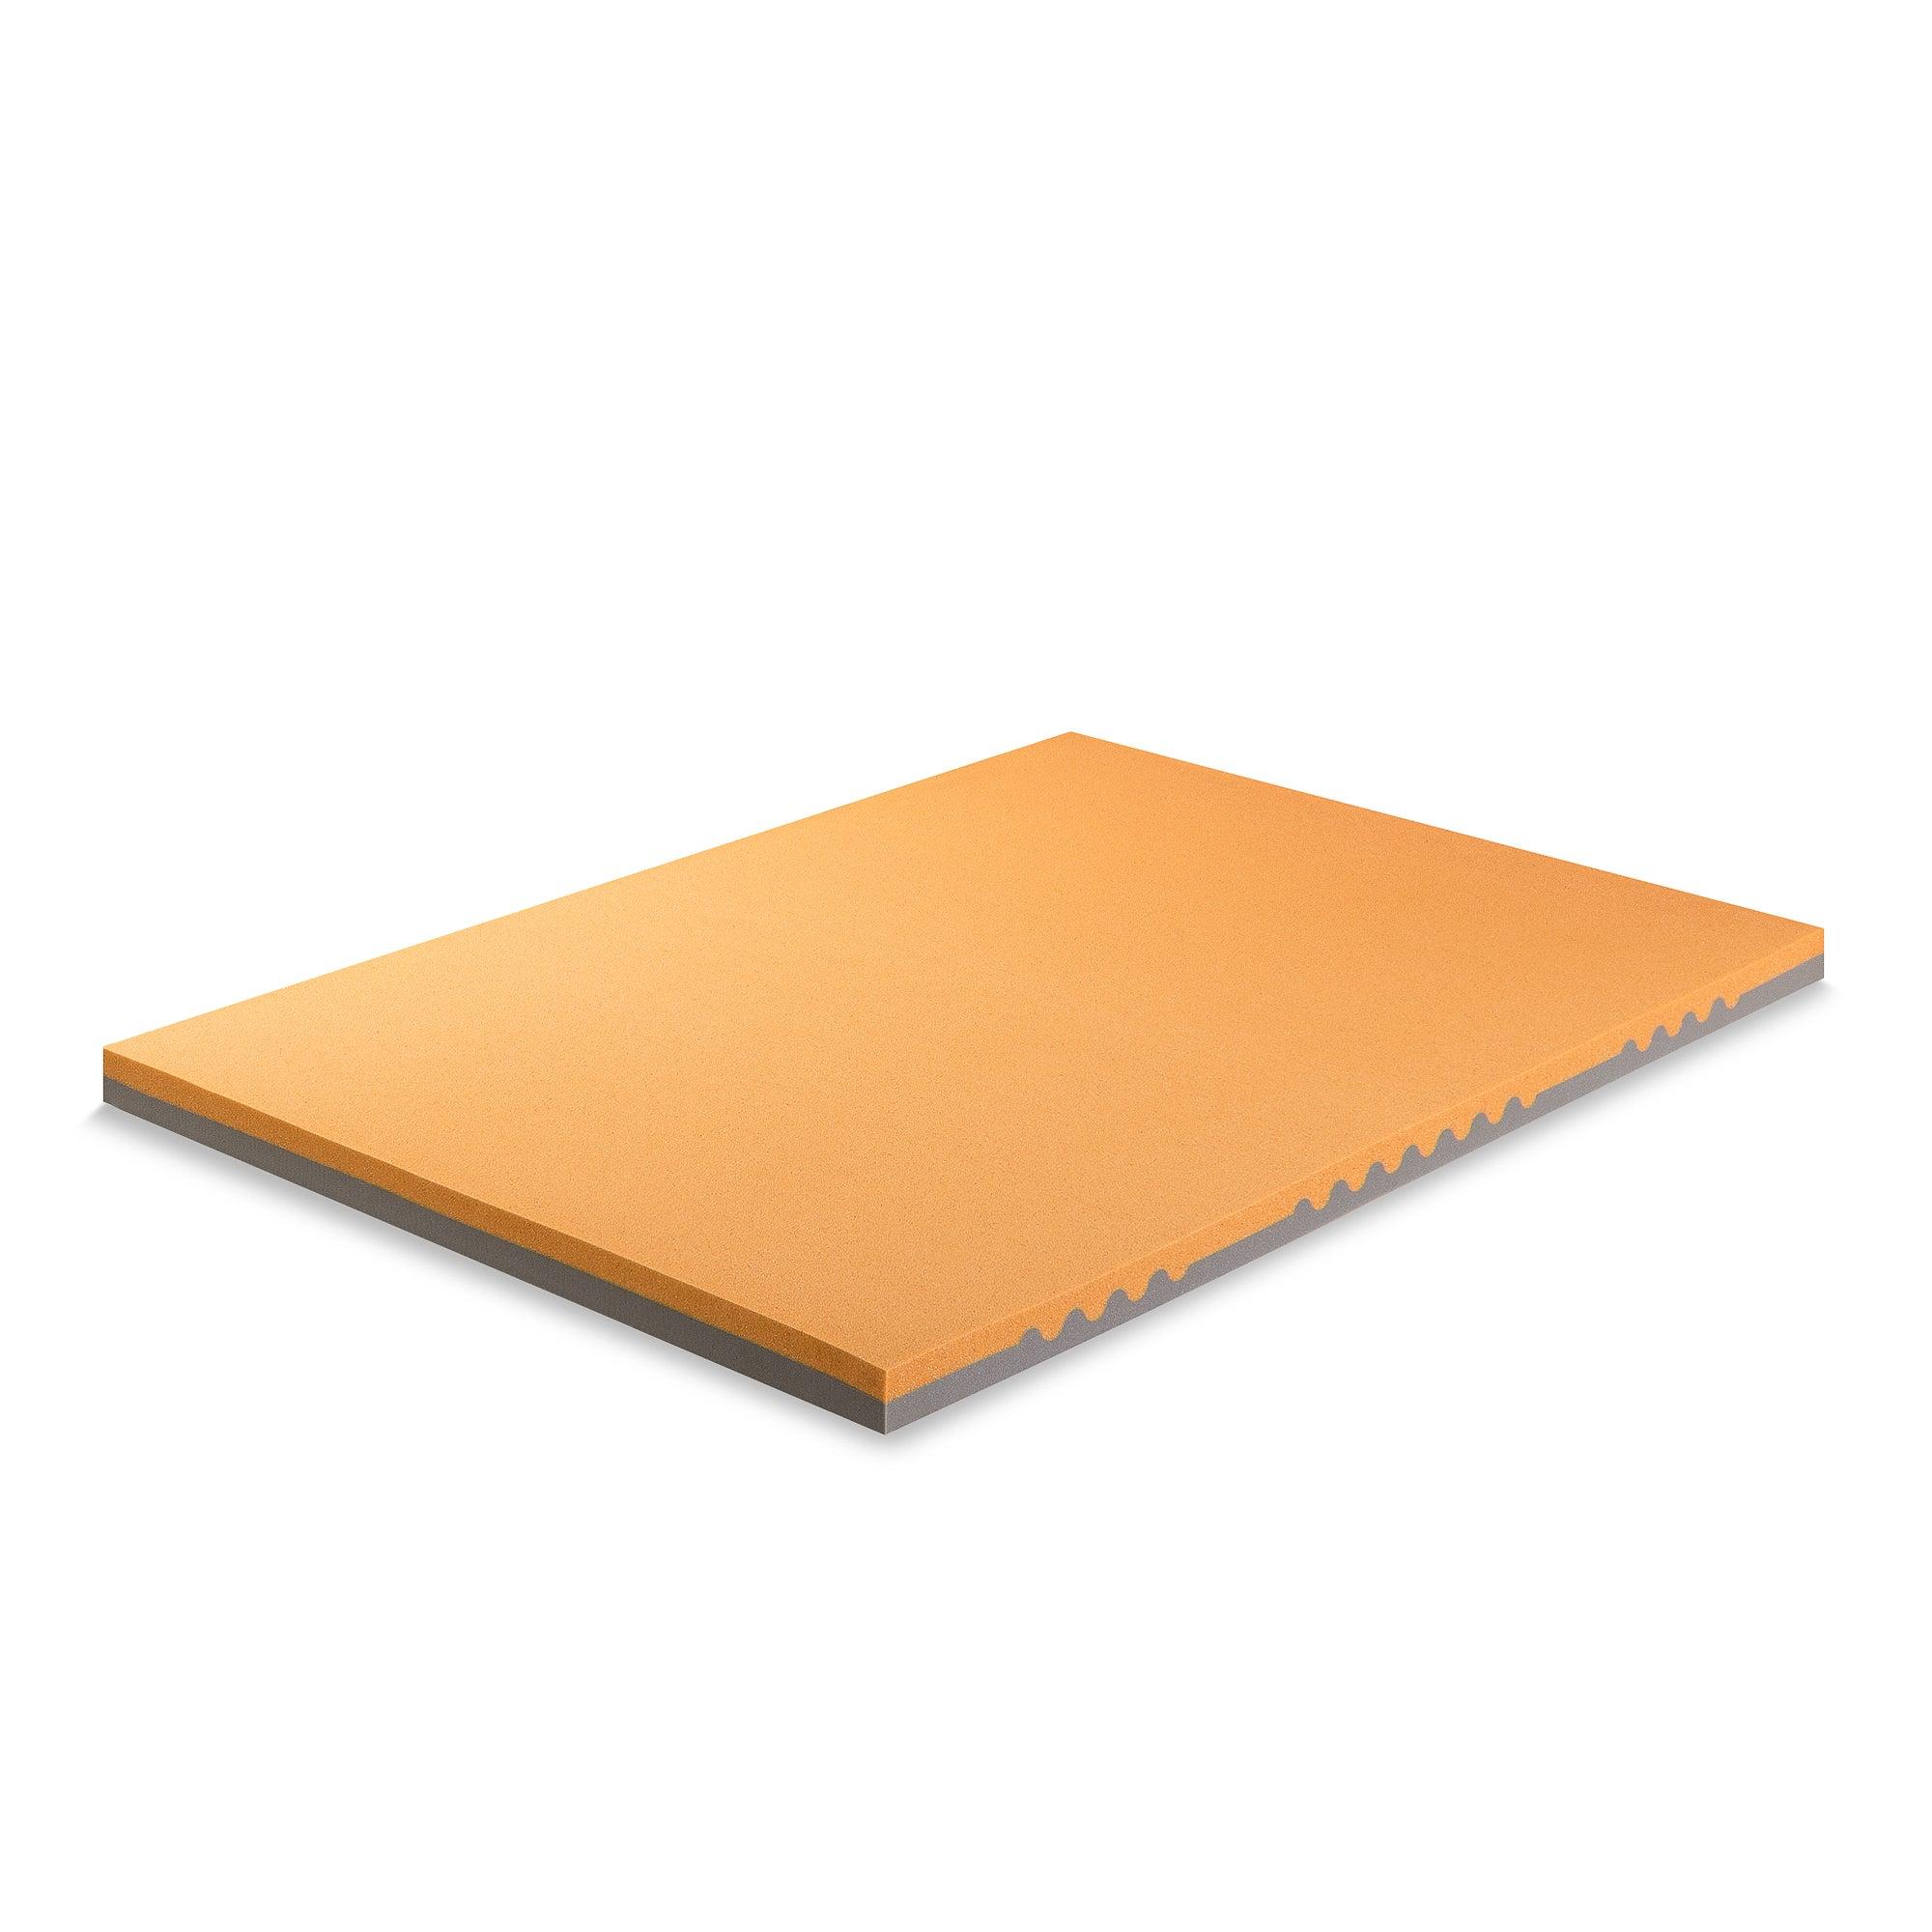 Zinus 7 5cm Torso Tec Gel Cool Antimicrobial Copper Memory